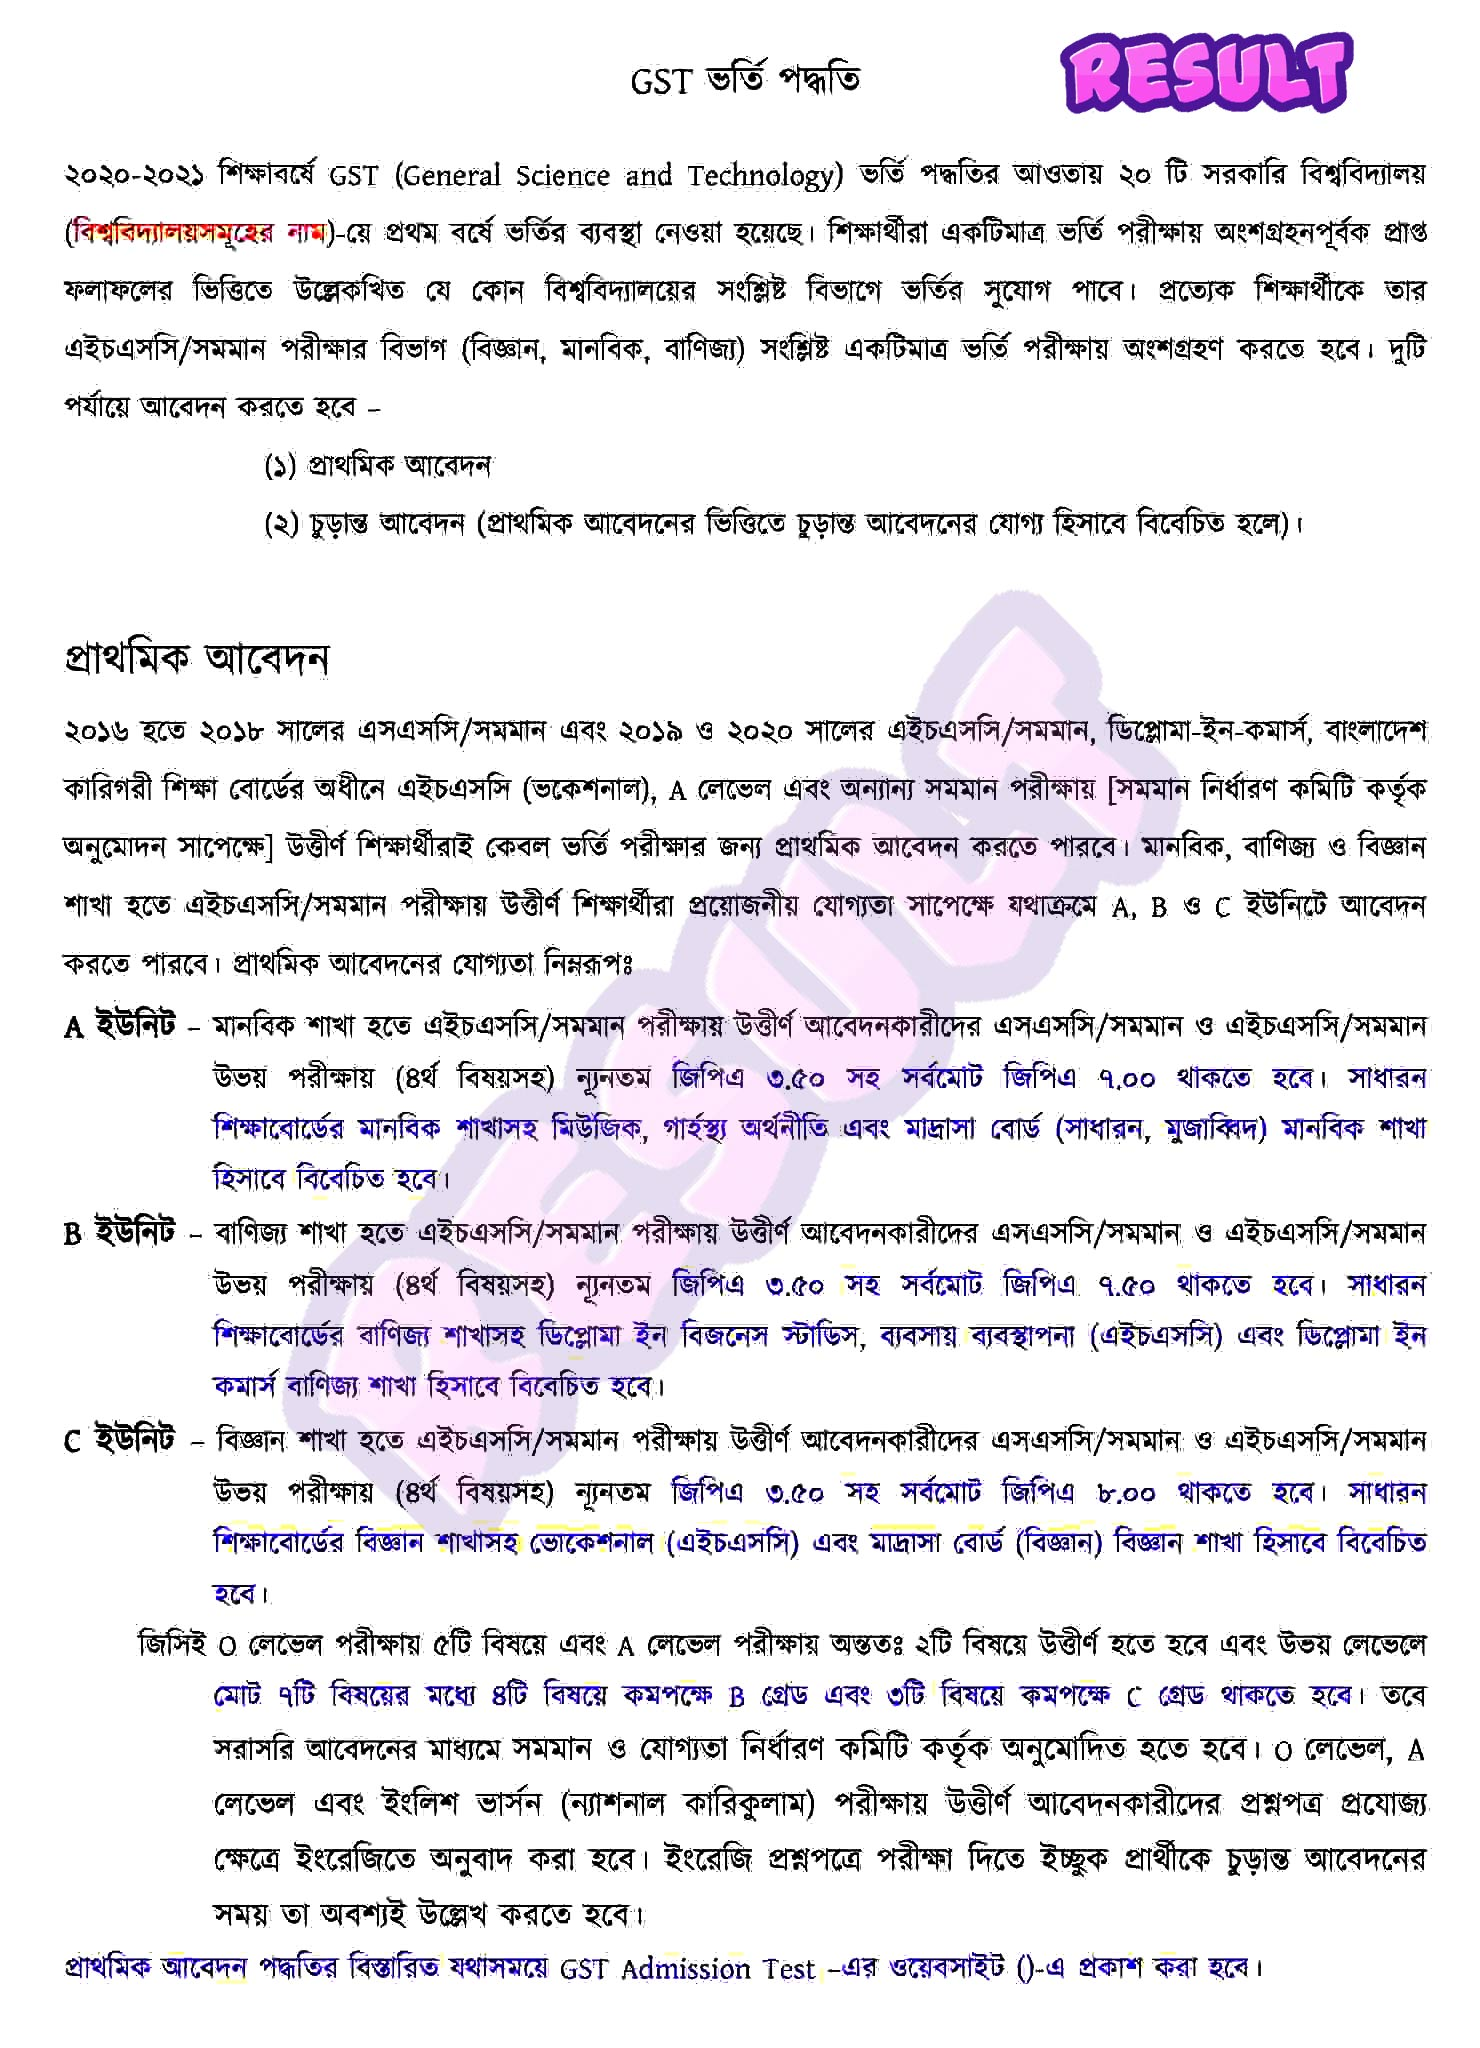 gst-admission-notice